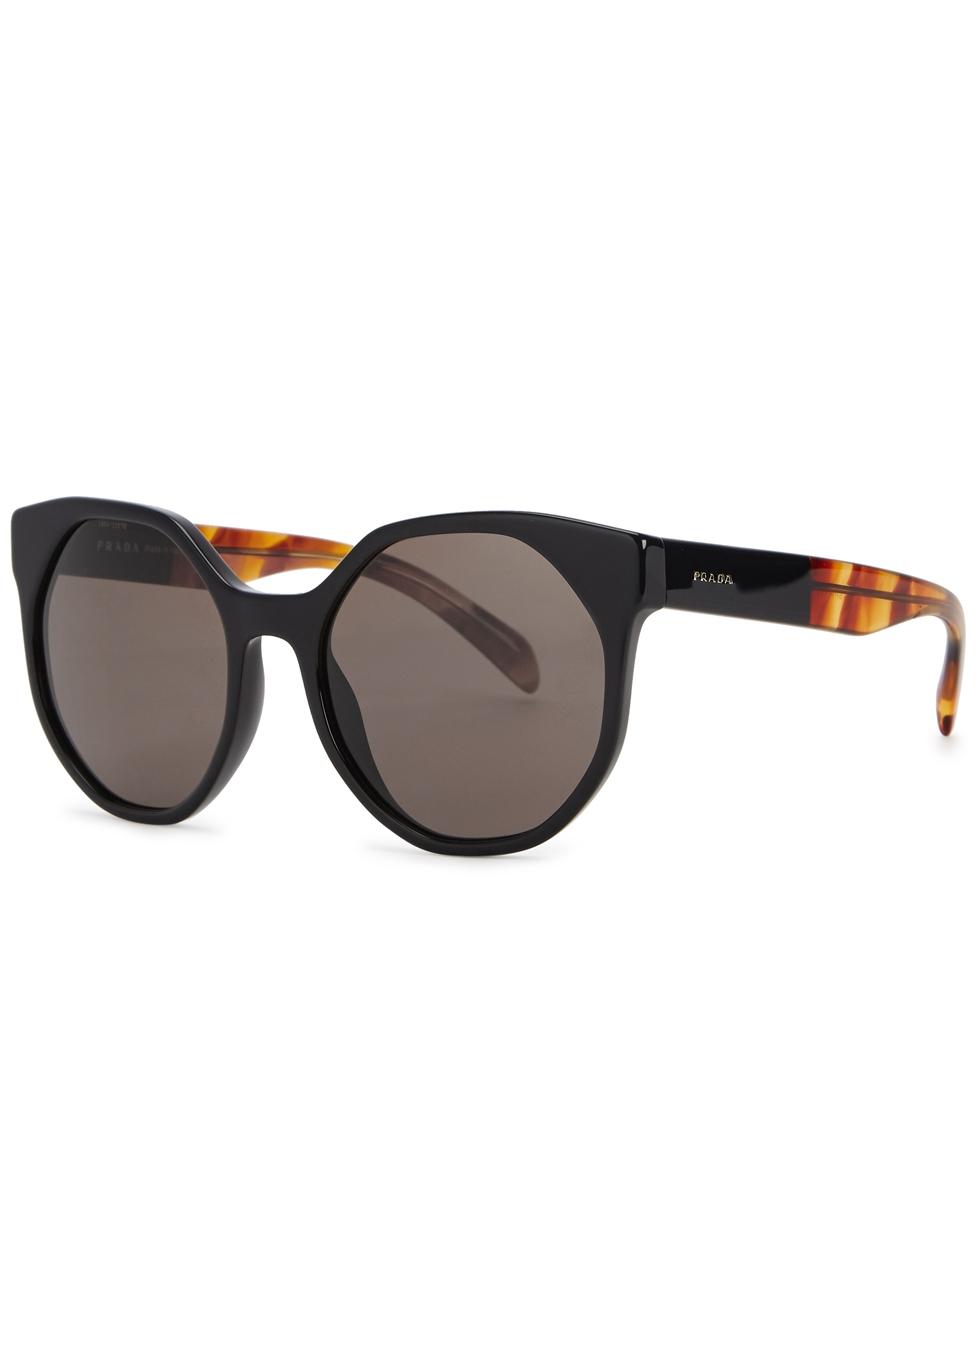 Black cat-eye sunglasses - Prada